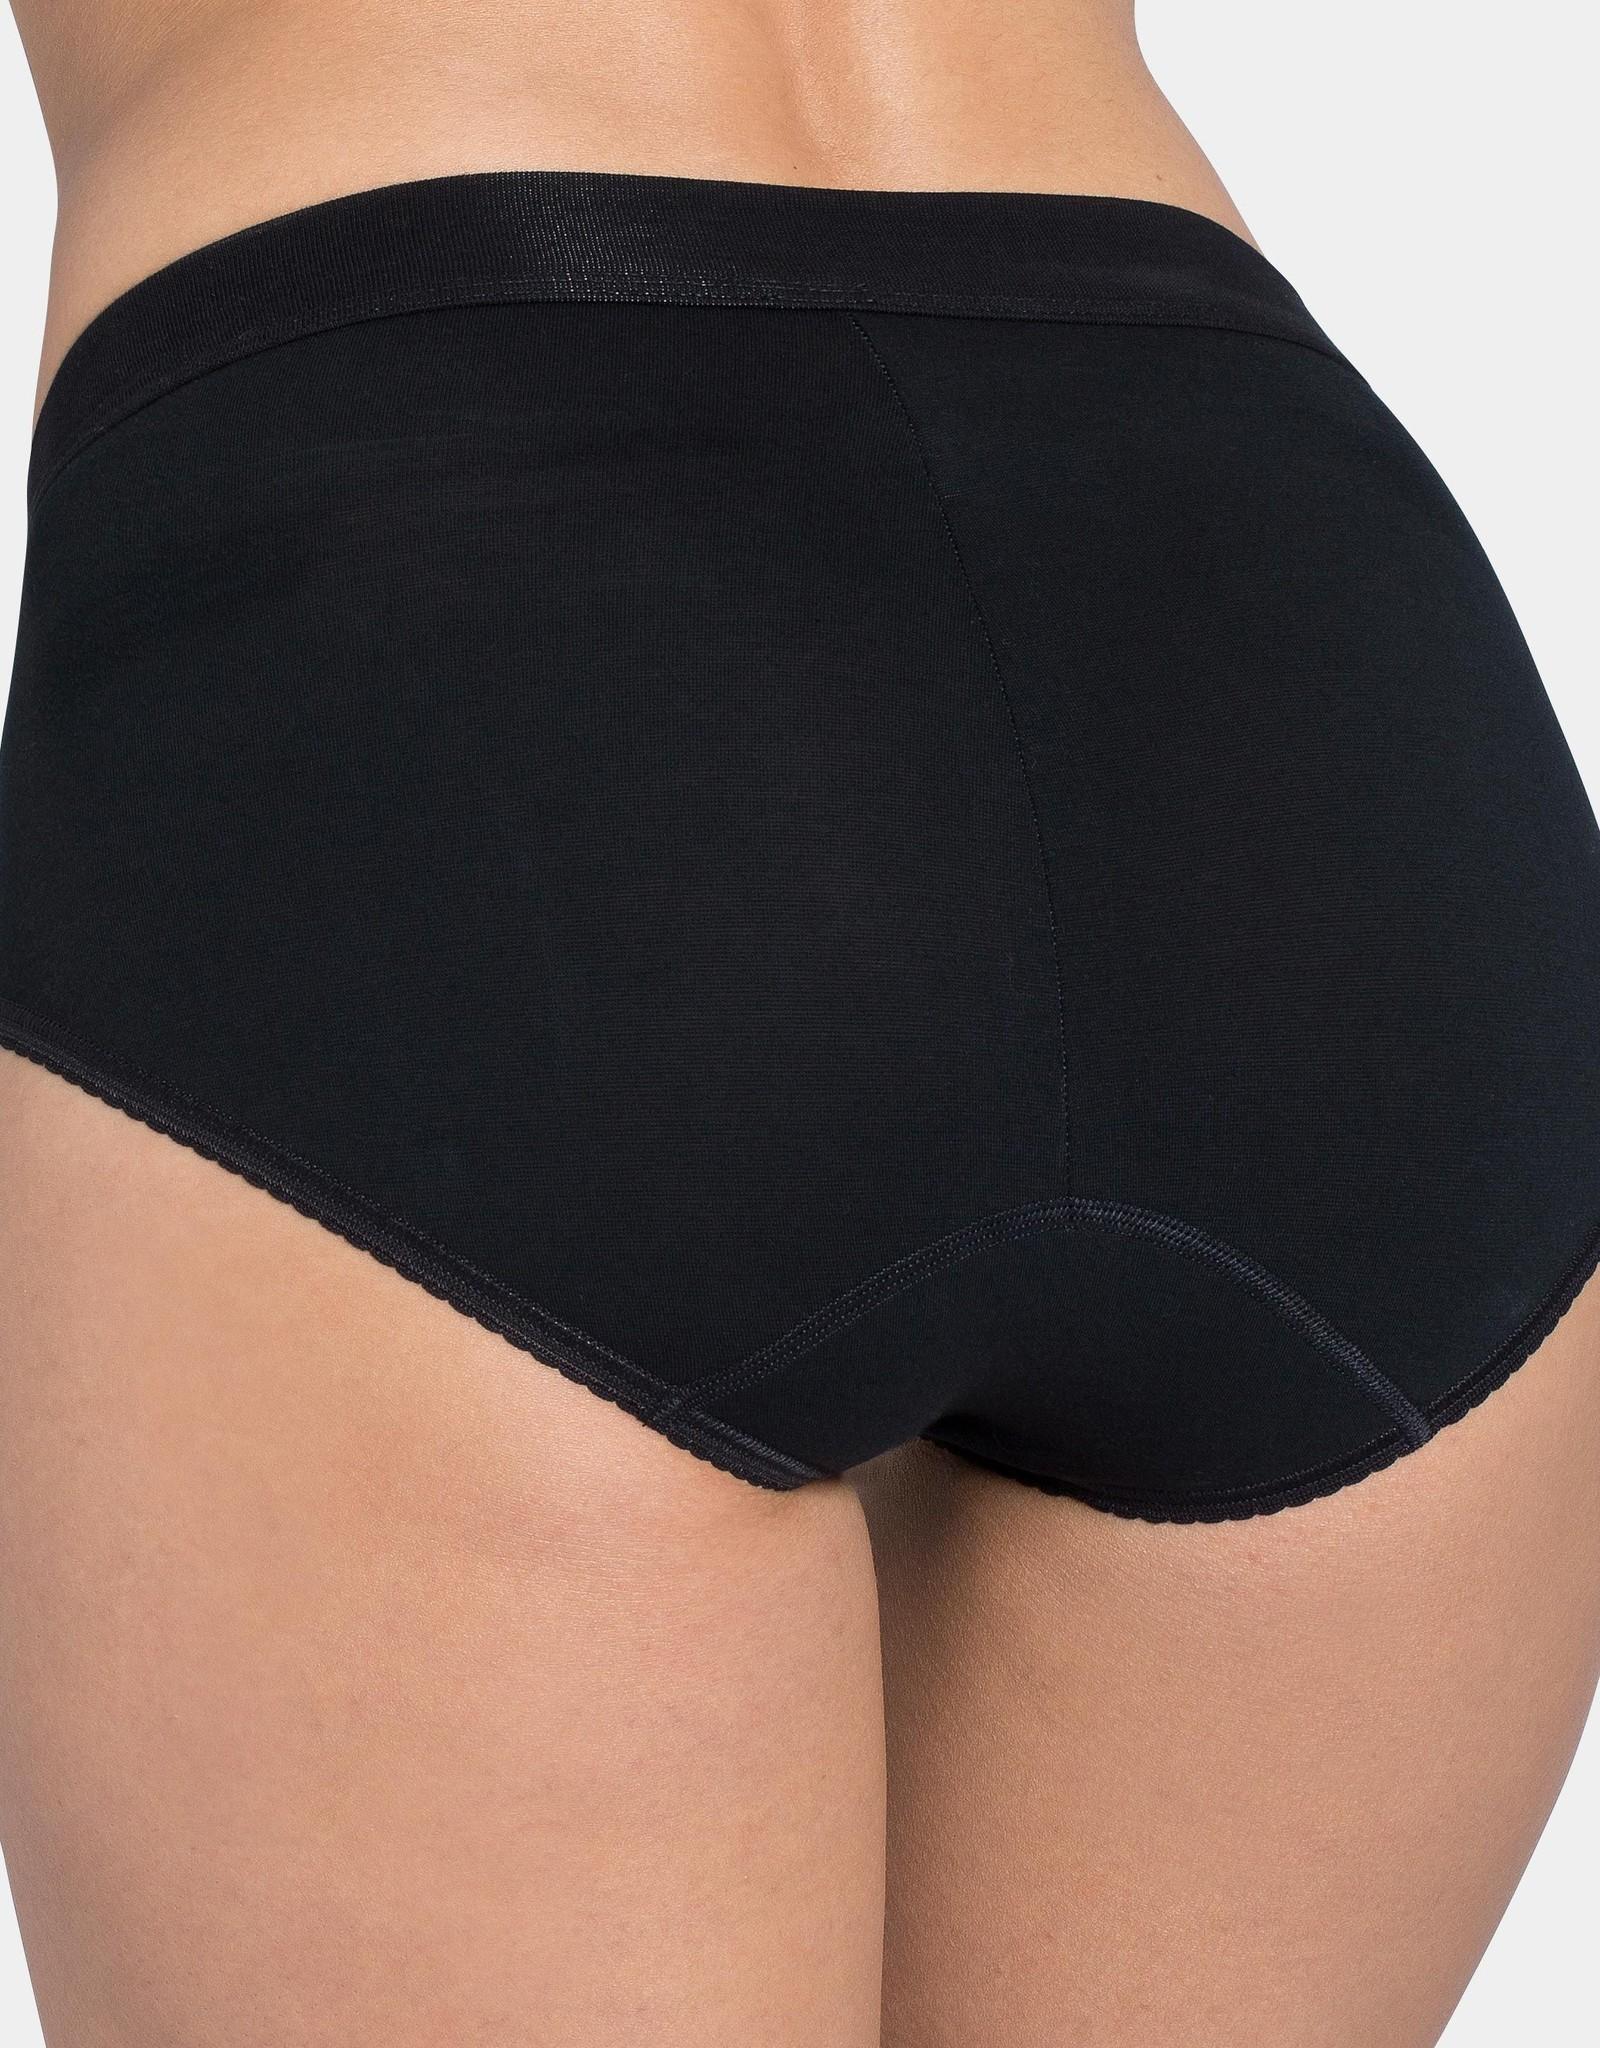 Sloggi Double Comfort Maxi